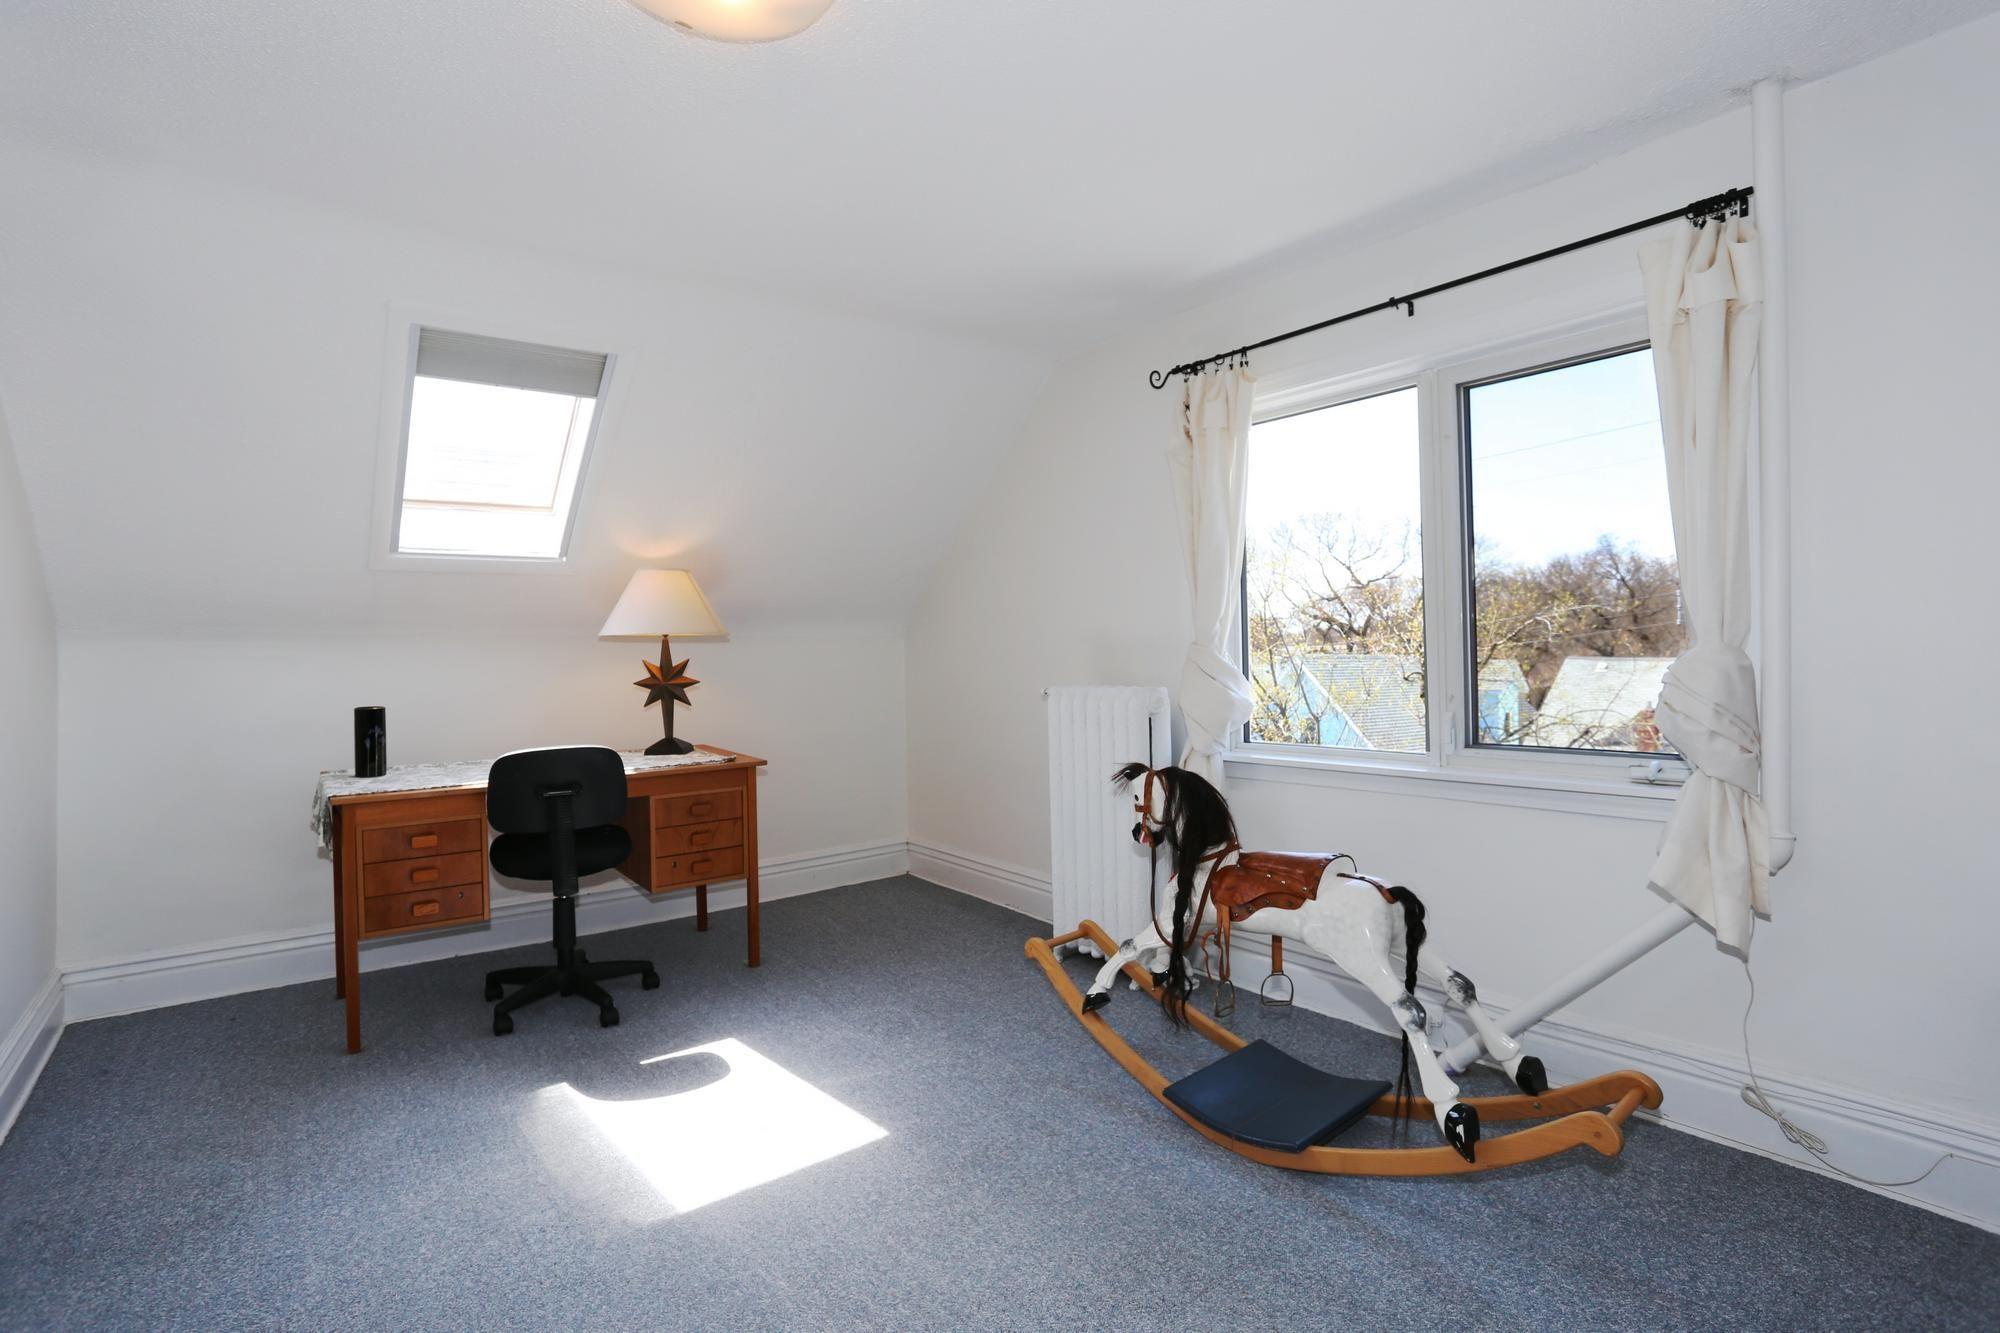 Photo 31: Photos: 96 Home Street in Winnipeg: Wolseley Single Family Detached for sale (5B)  : MLS®# 1810985